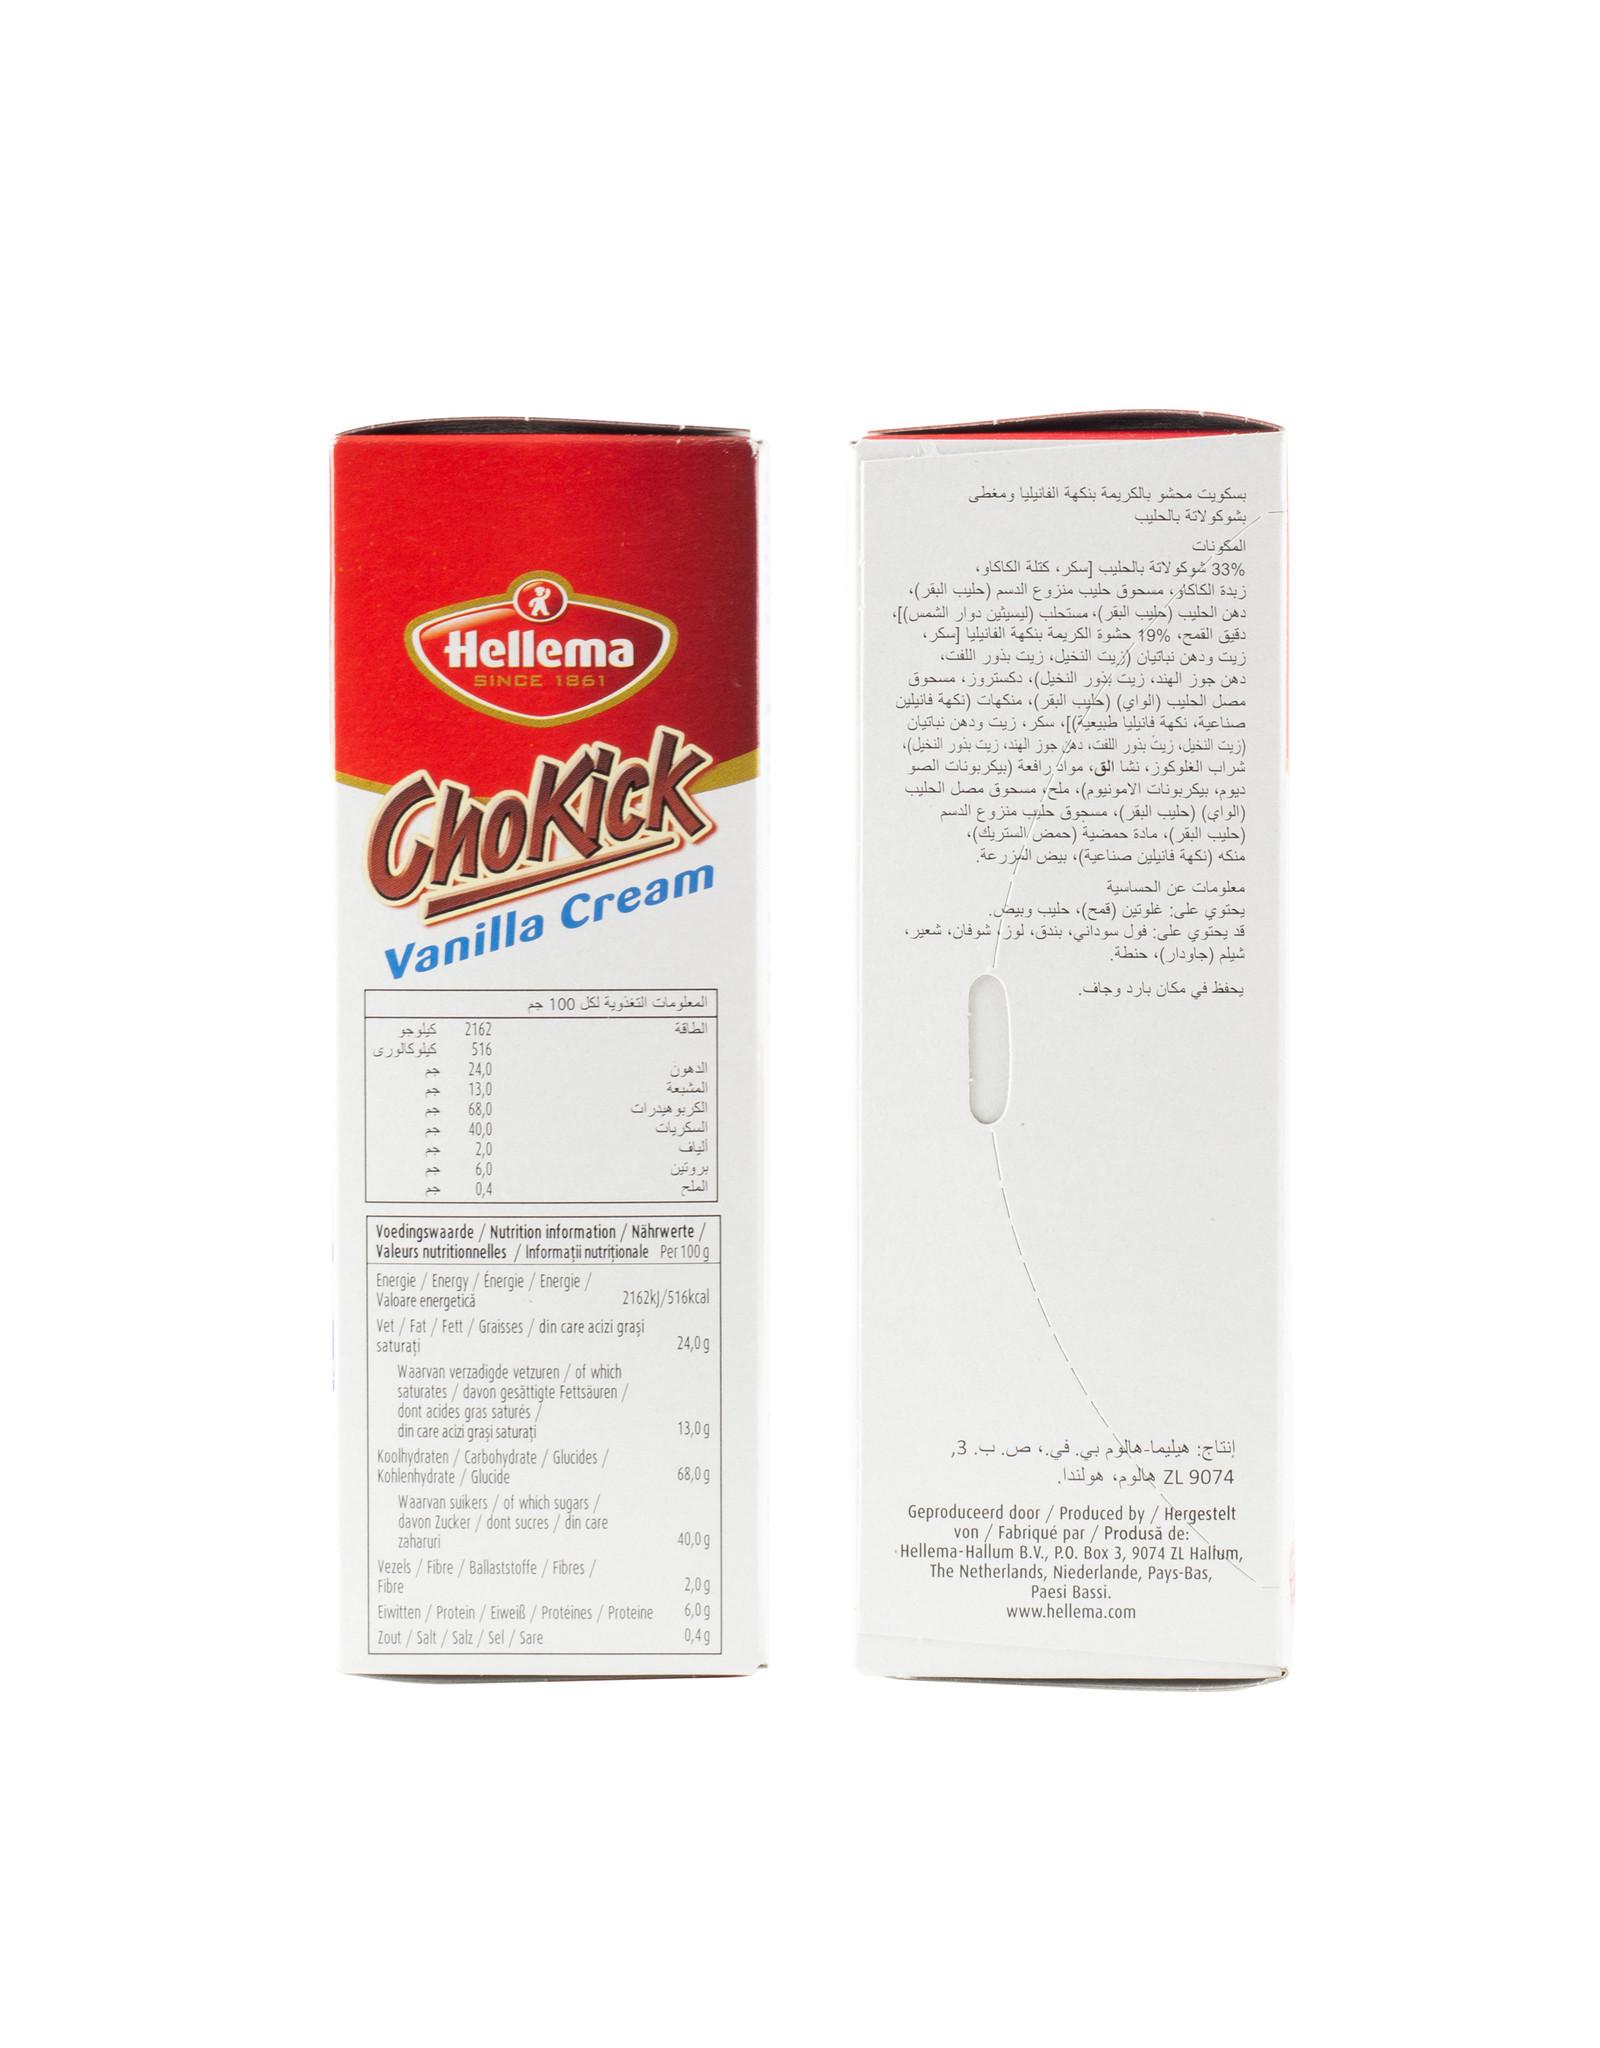 Hellema HELLEMA ChoKick Vanilla Cream Cookies - 180 grams pack